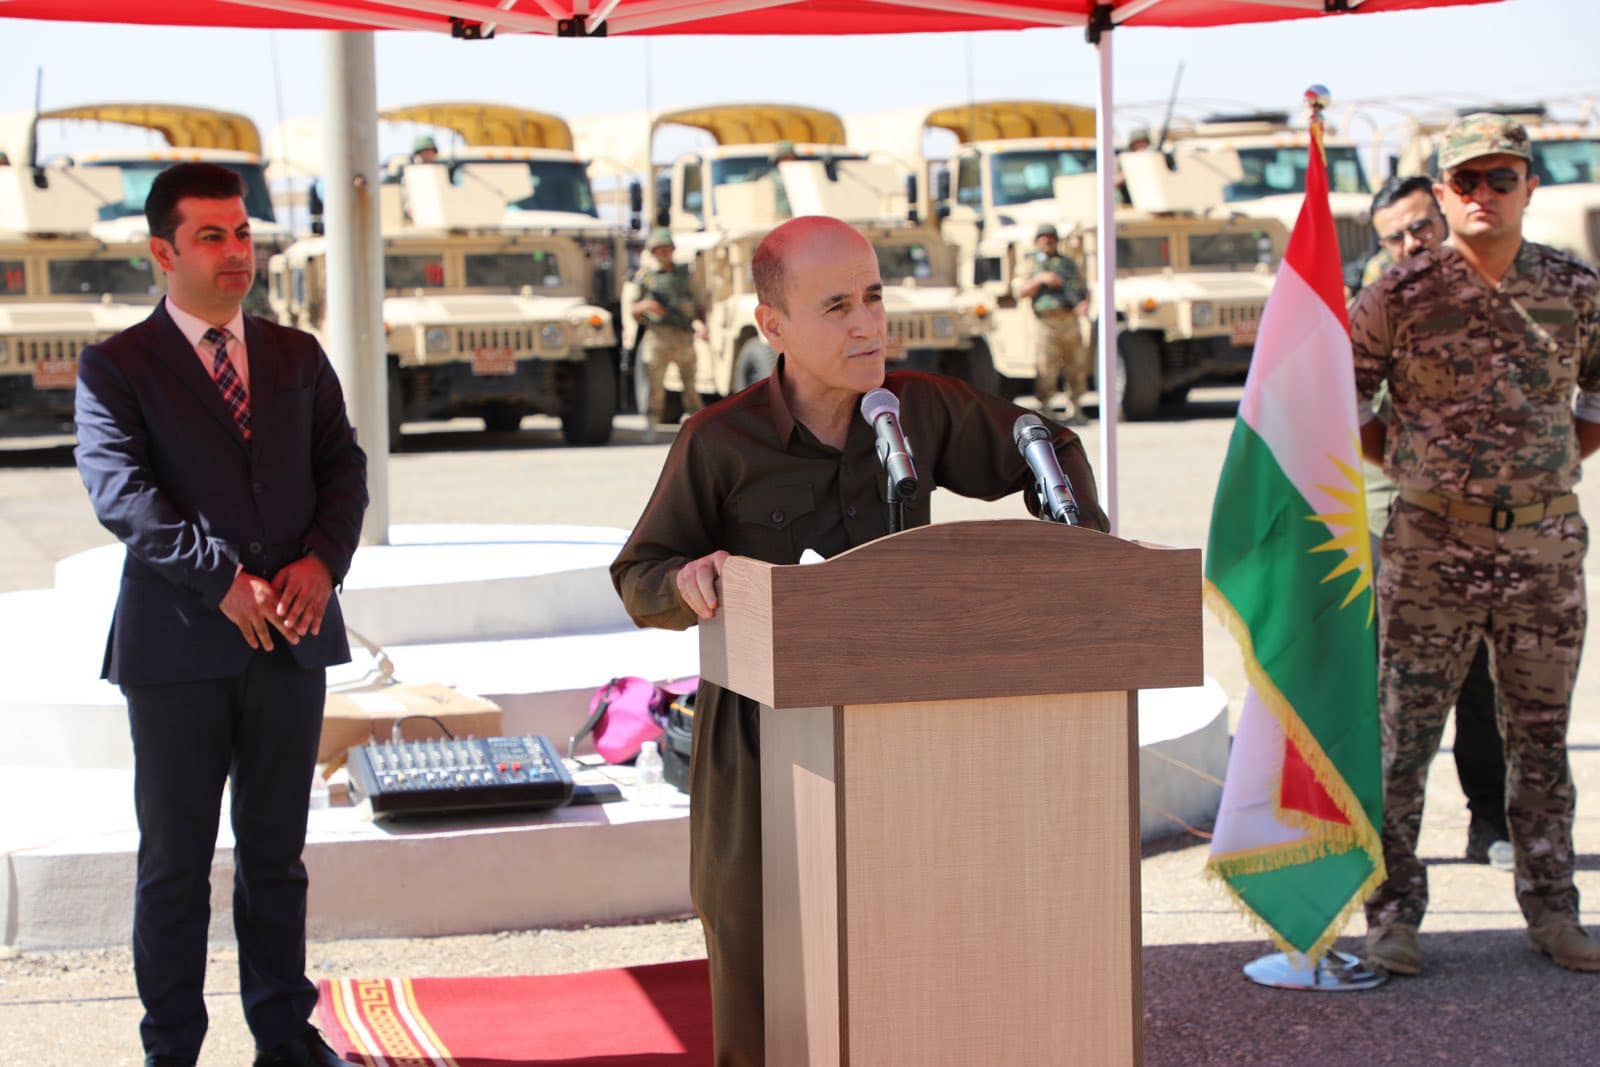 وزير پێشمەرگە: پەیوەندیەیلمان وەرد سوپای عراق خاسەو بۊینە